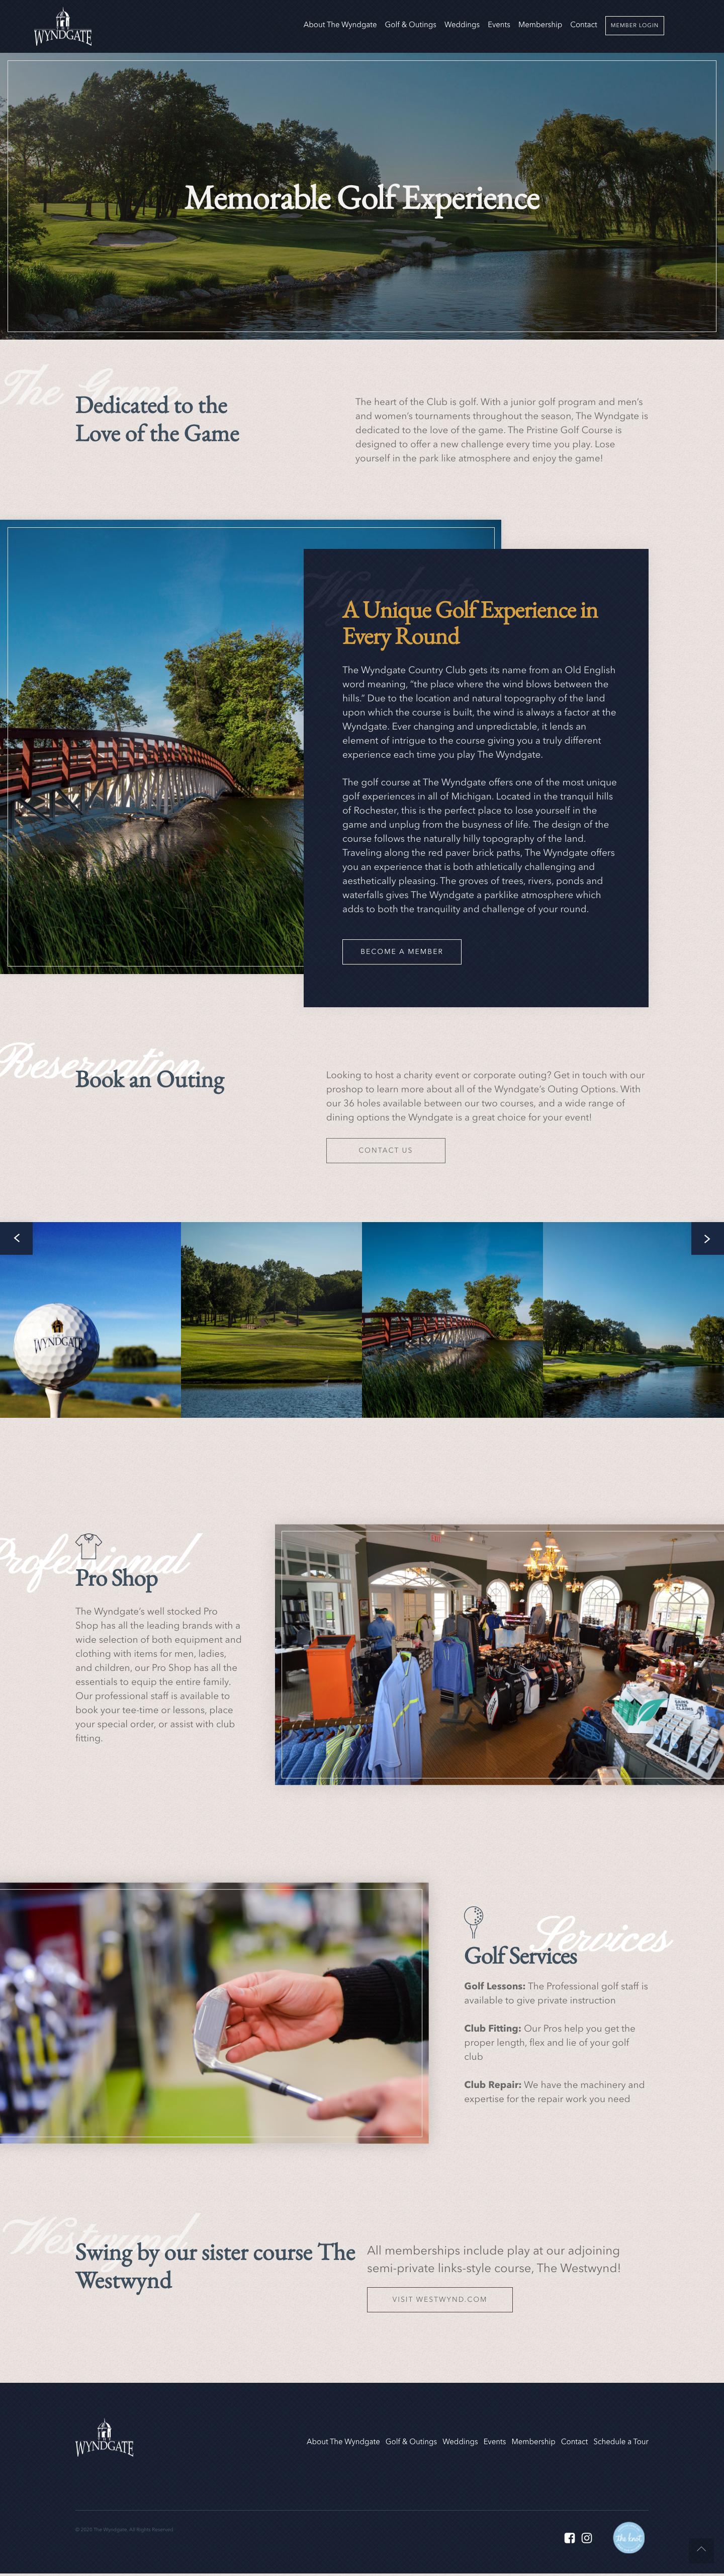 country club website membership